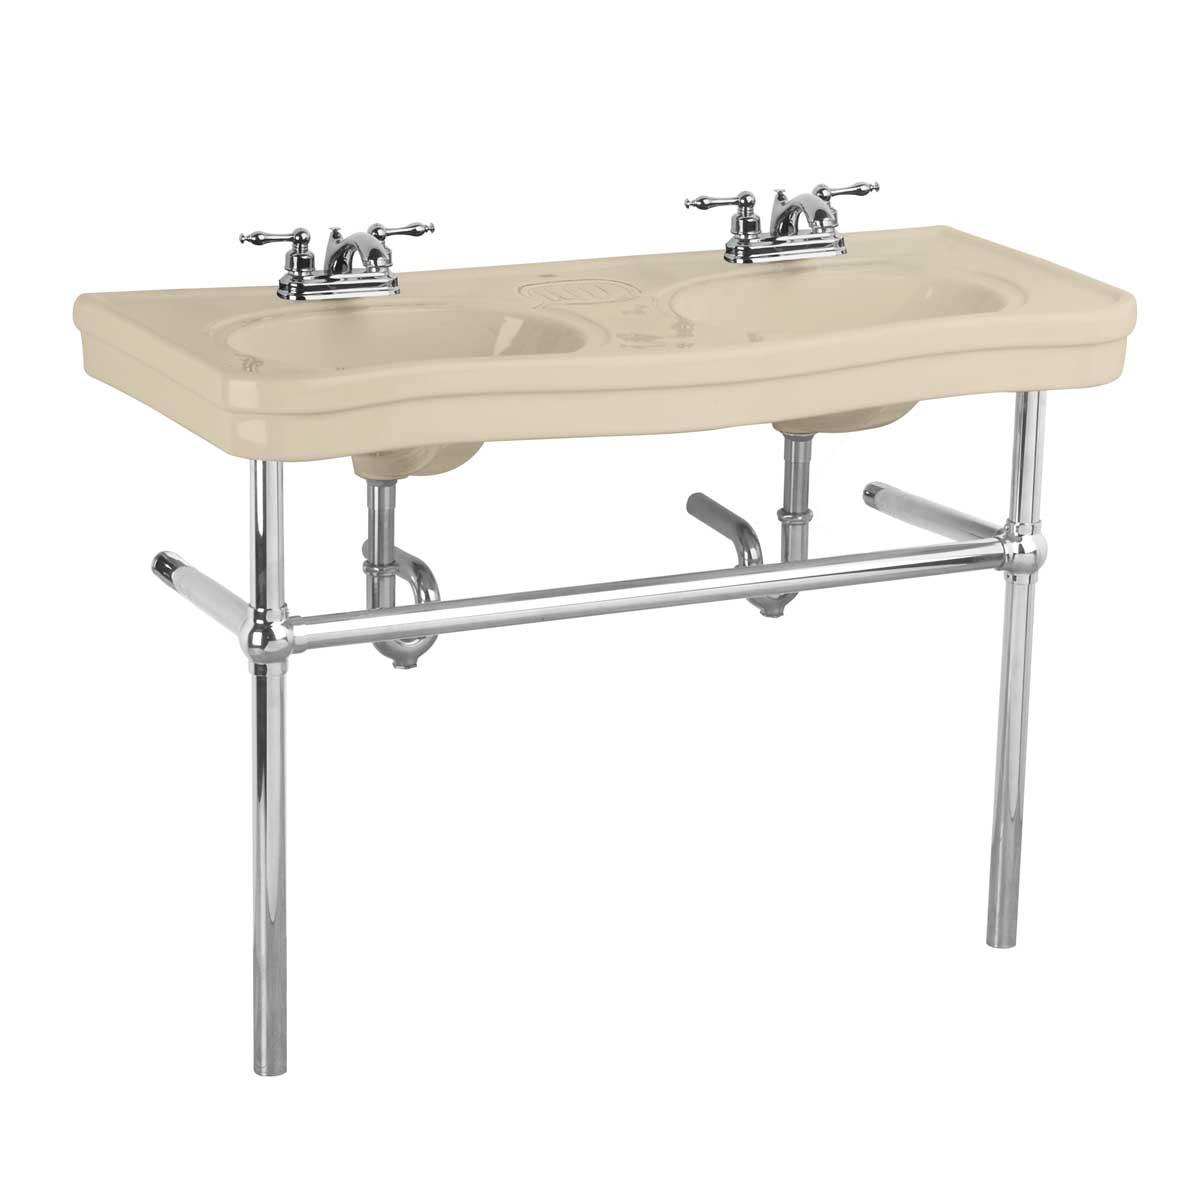 Bathroom console deluxe double sink 4 faucet bone chrome leg for Bathroom console